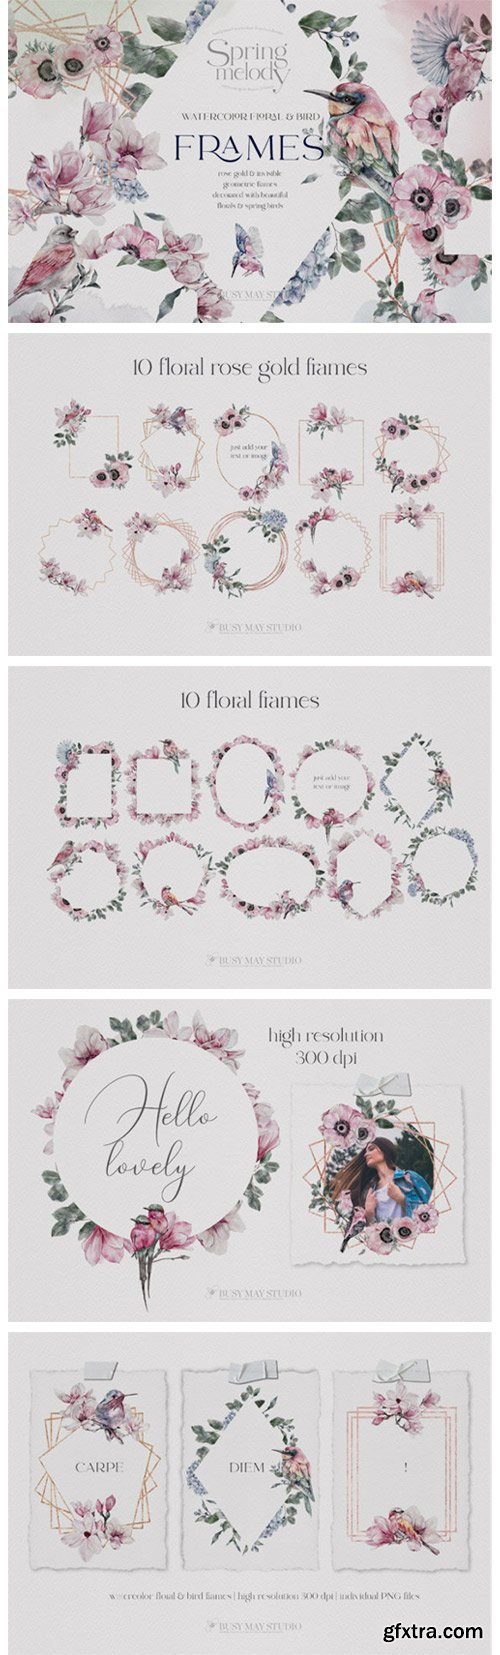 Watercolor Floral Rose Gold Frames PNG 7637209